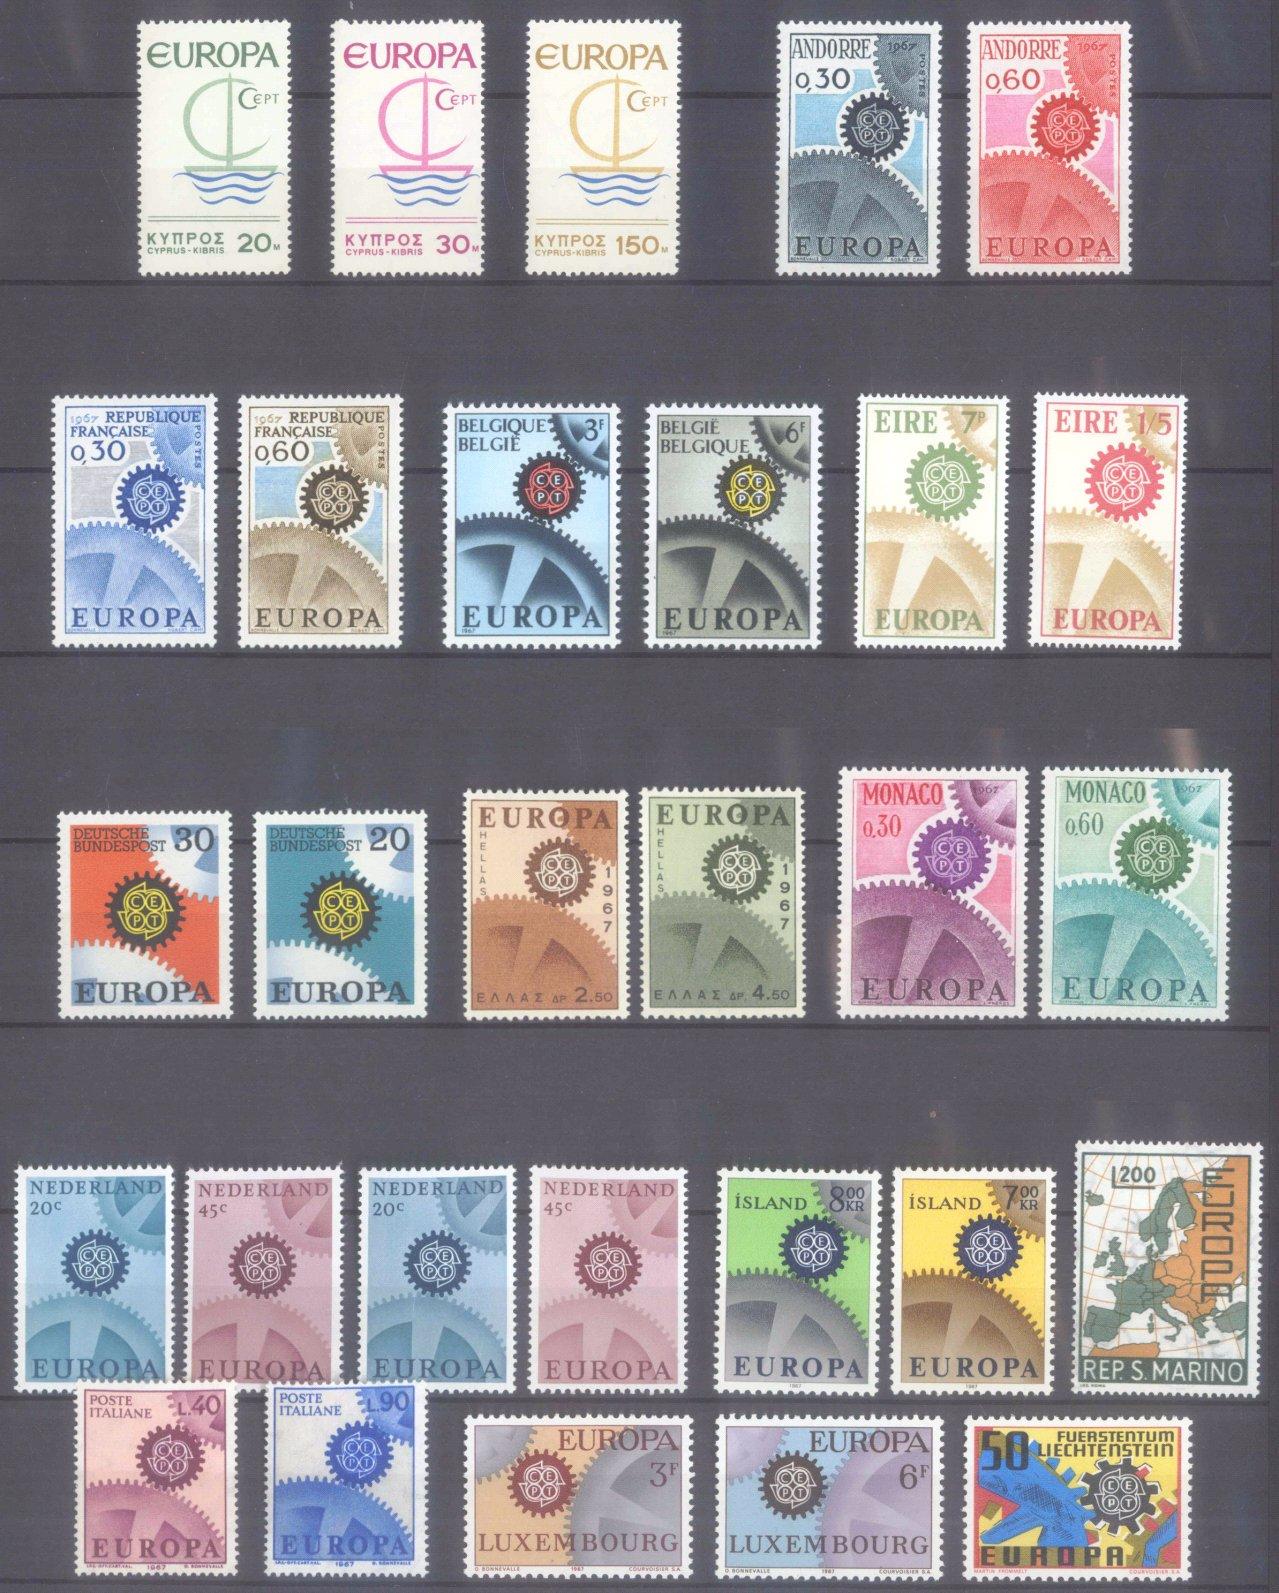 EUROPA CEPT 1956 – 1970-15